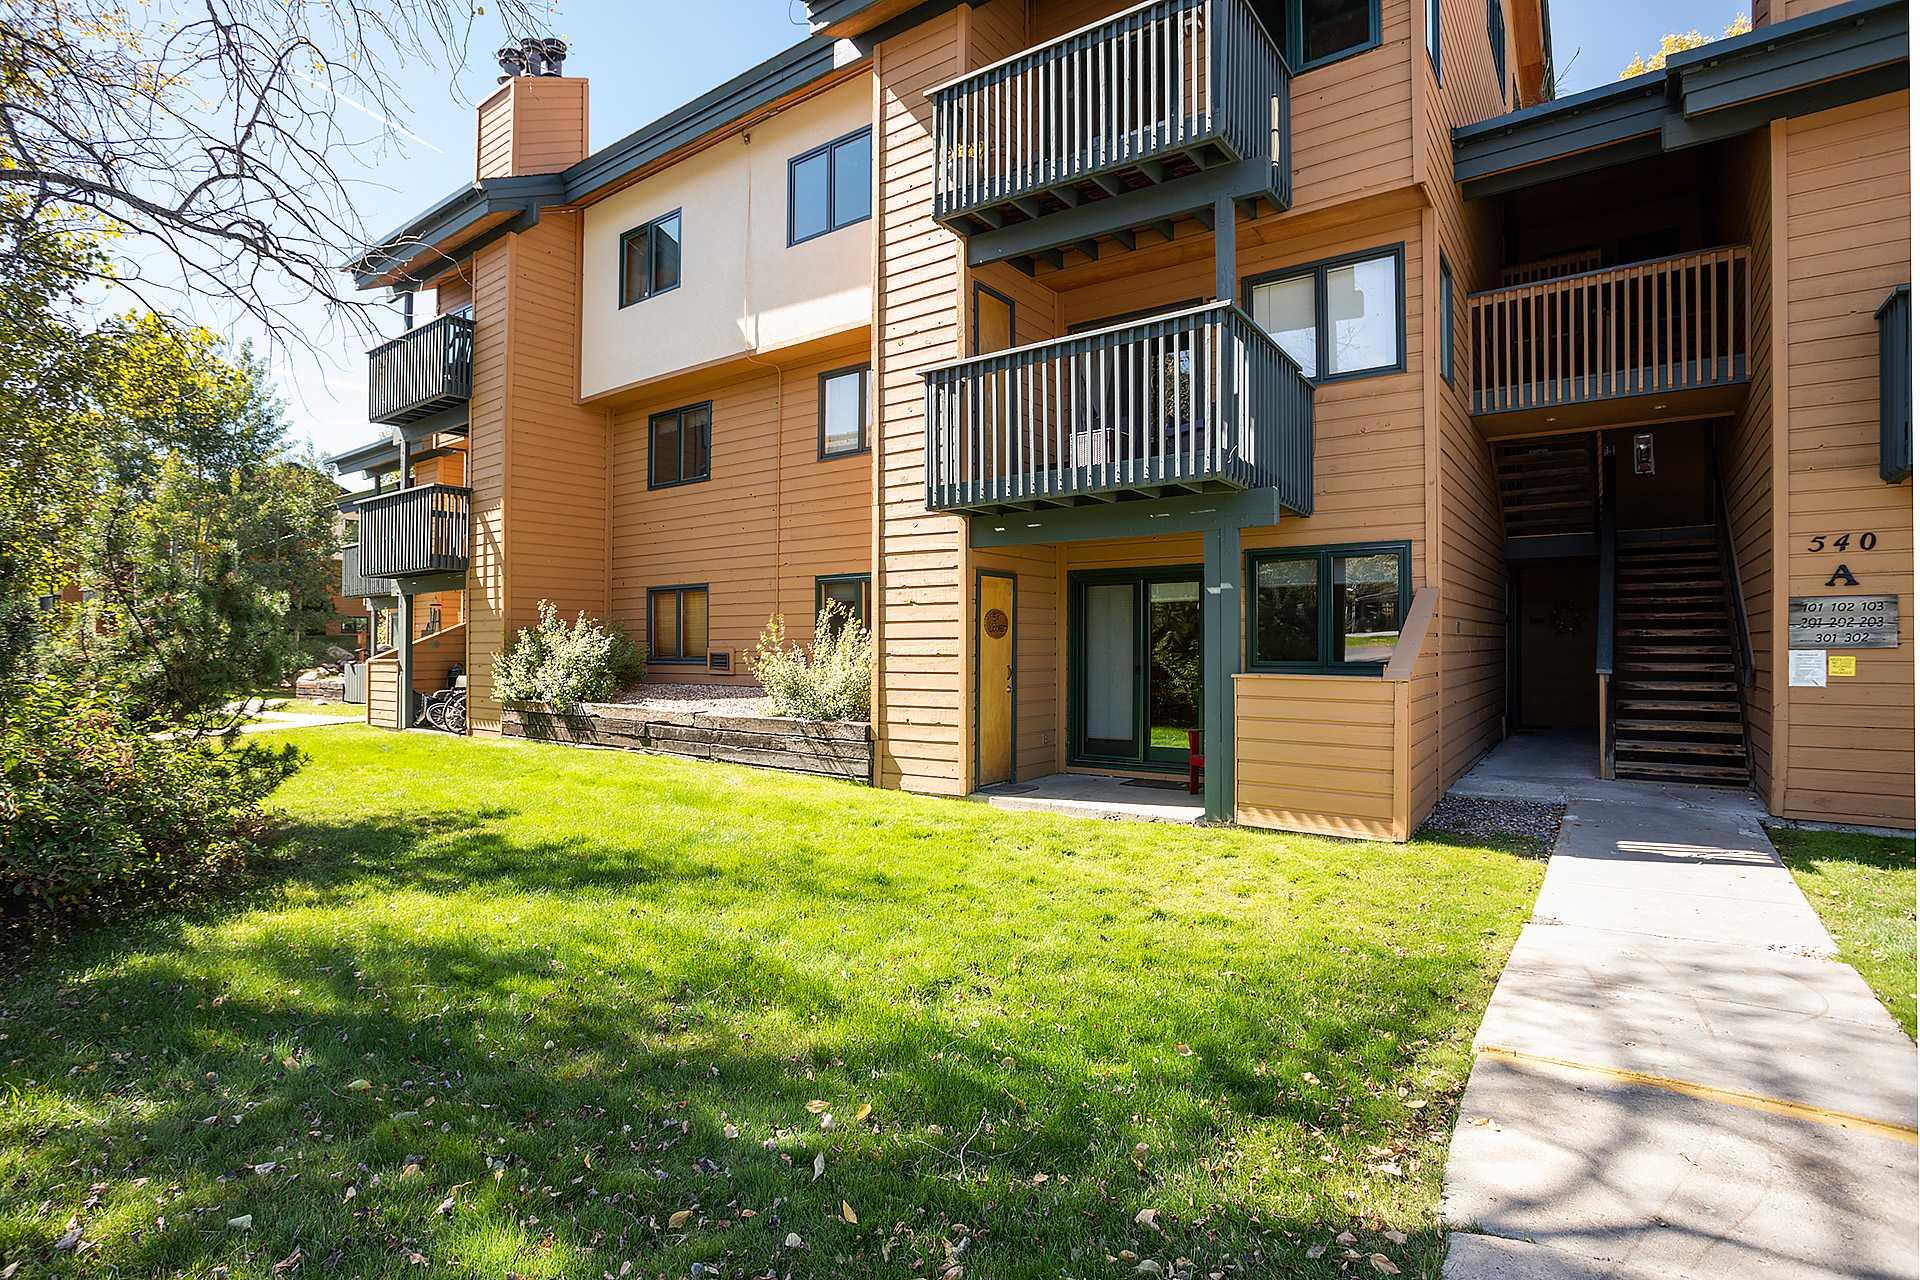 P103A - The Pines Condominiums